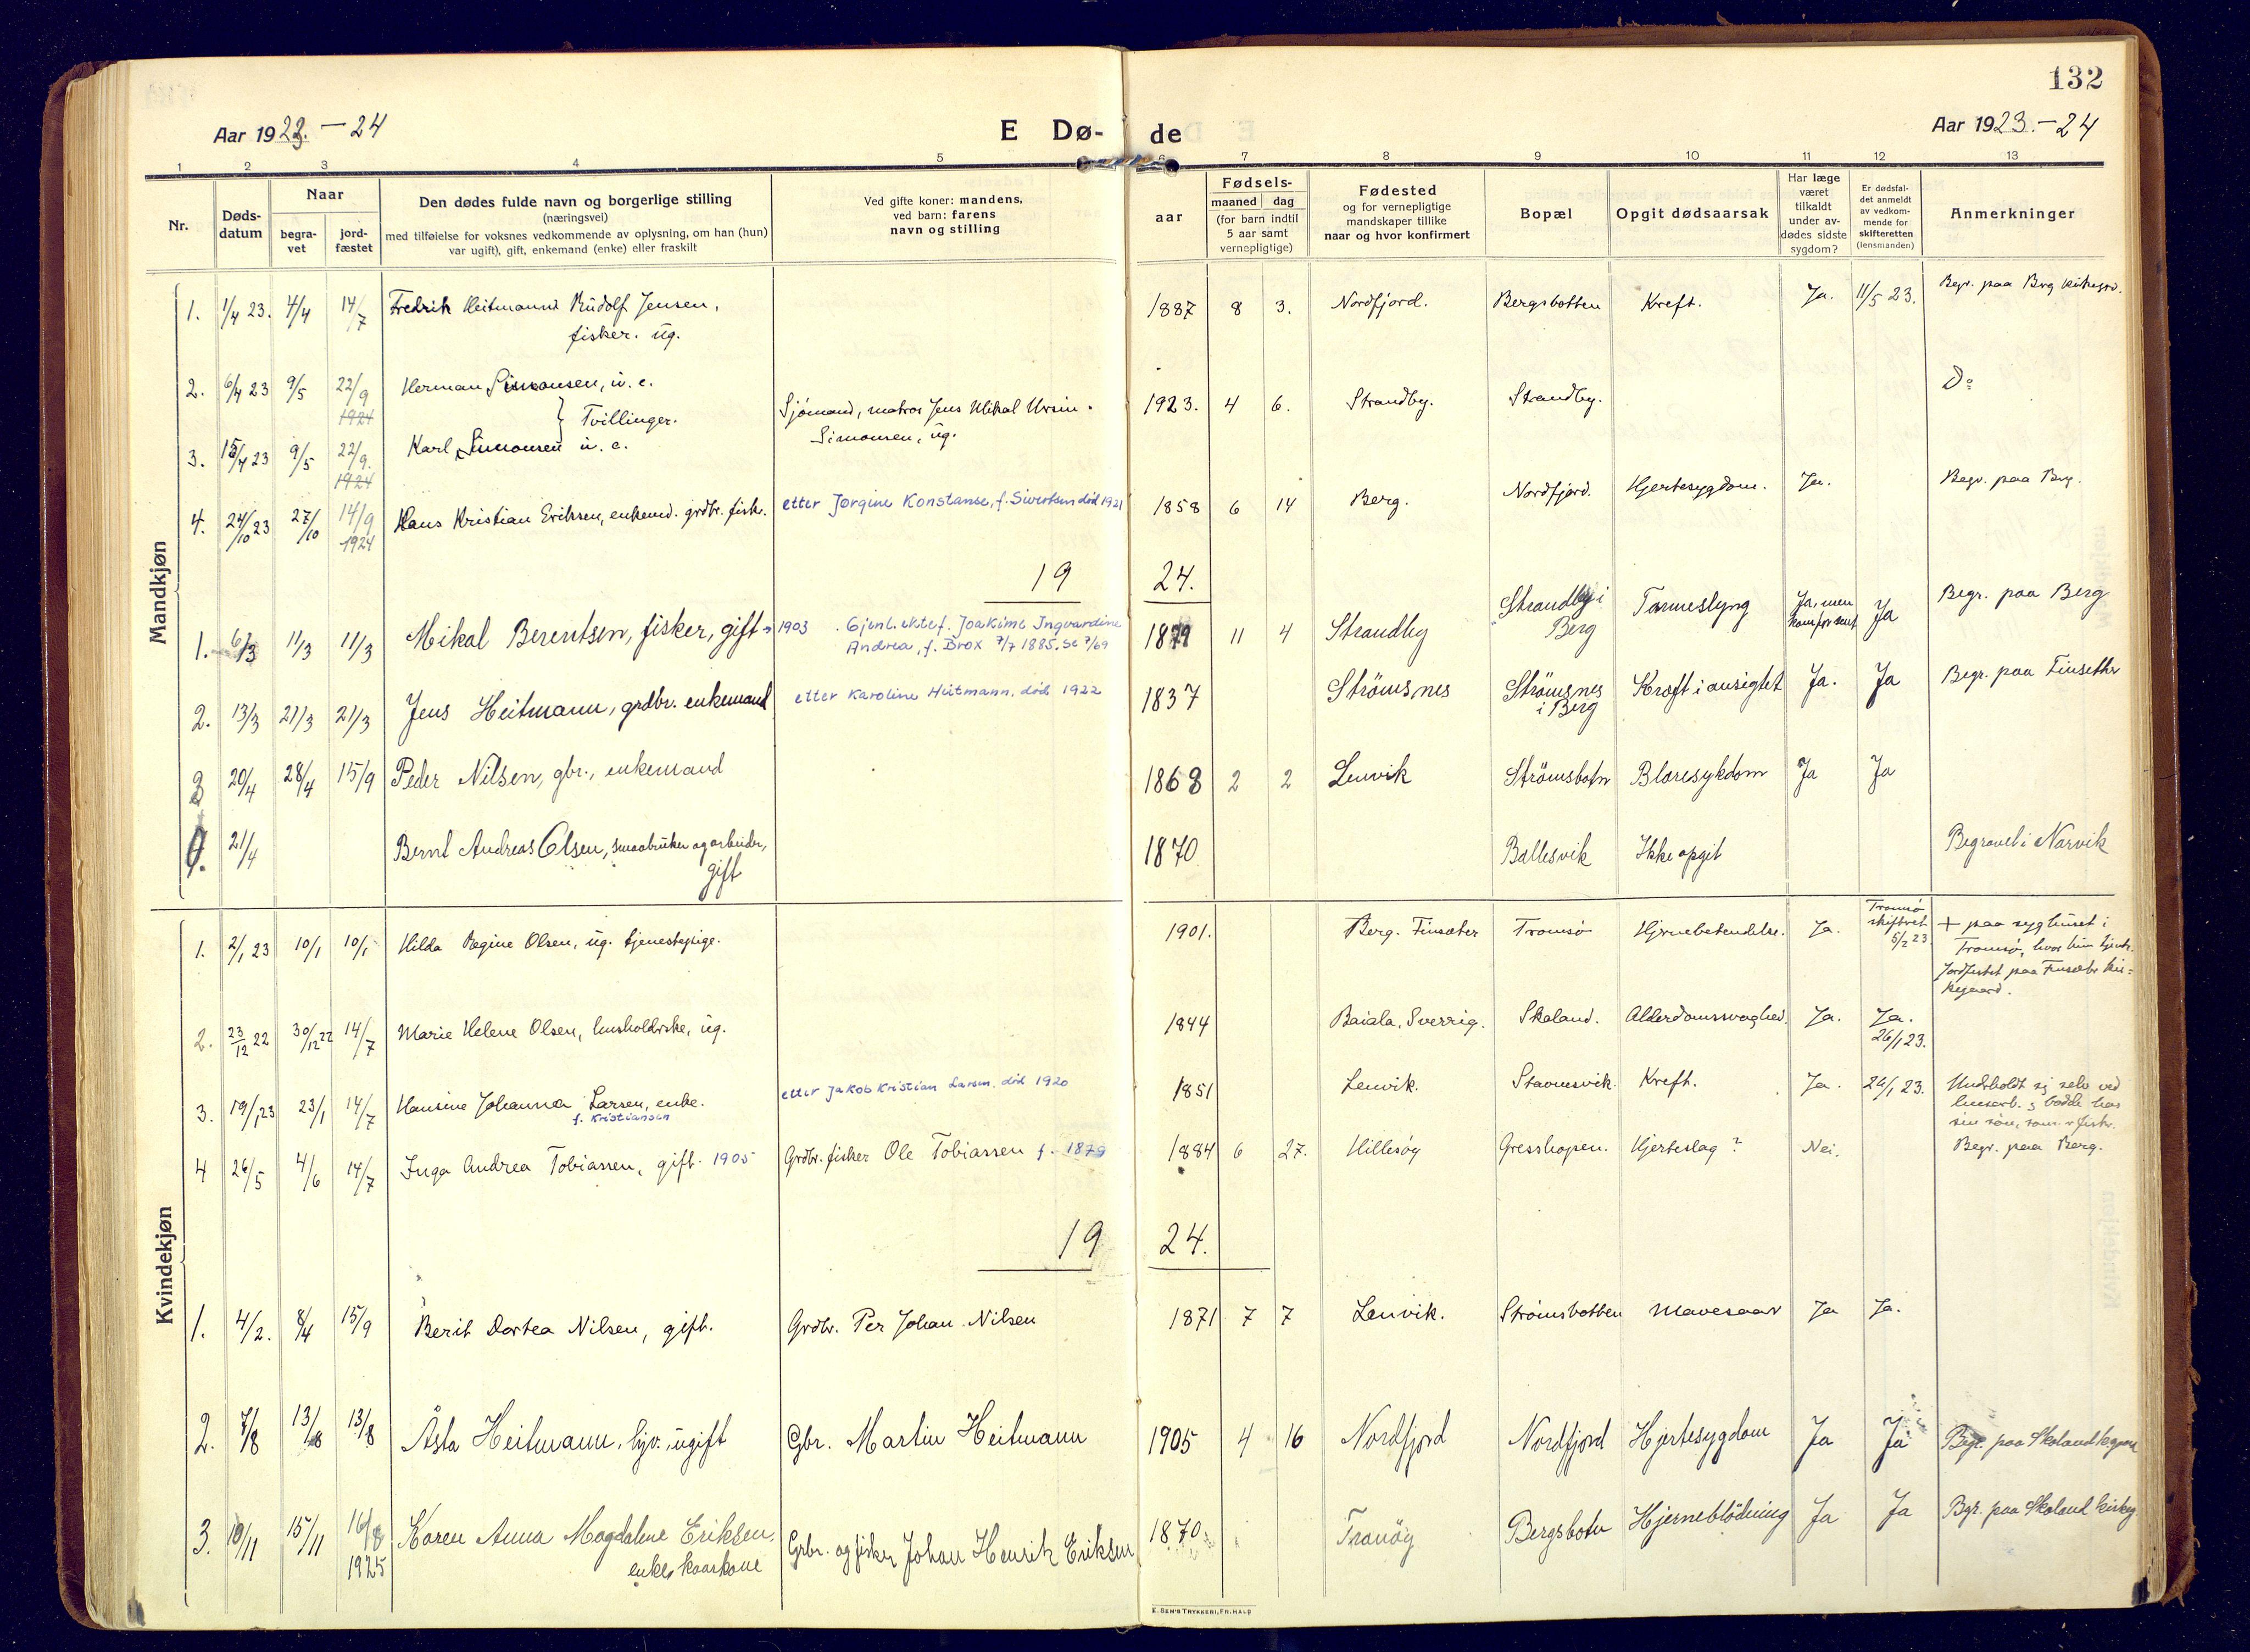 SATØ, Mefjord/Berg sokneprestkontor, G/Ga/Gaa: Ministerialbok nr. 9, 1916-1928, s. 132